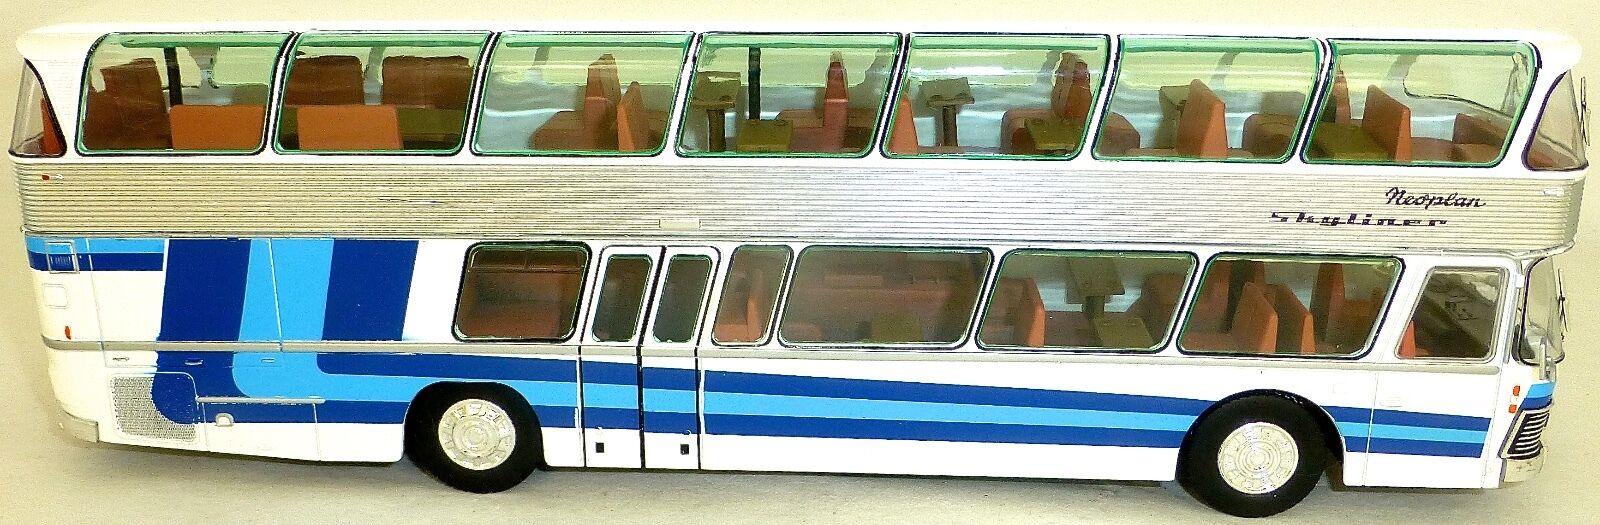 Neoplan Nh 22L Skyliner Bus Ixo 1 43 Nip He Μ